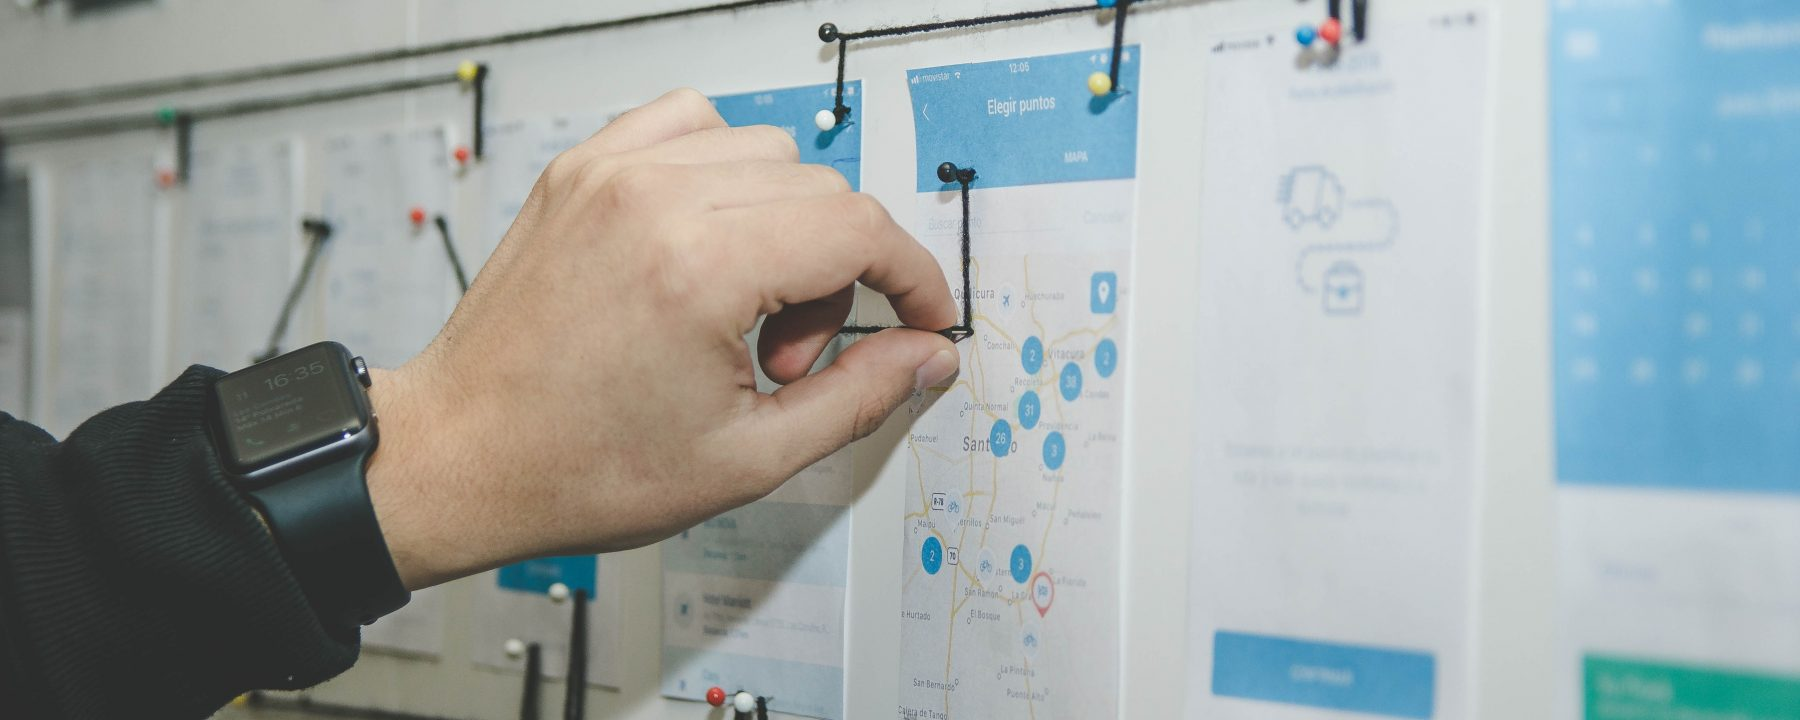 pretotyper prototyper tests innovation lab teknologi